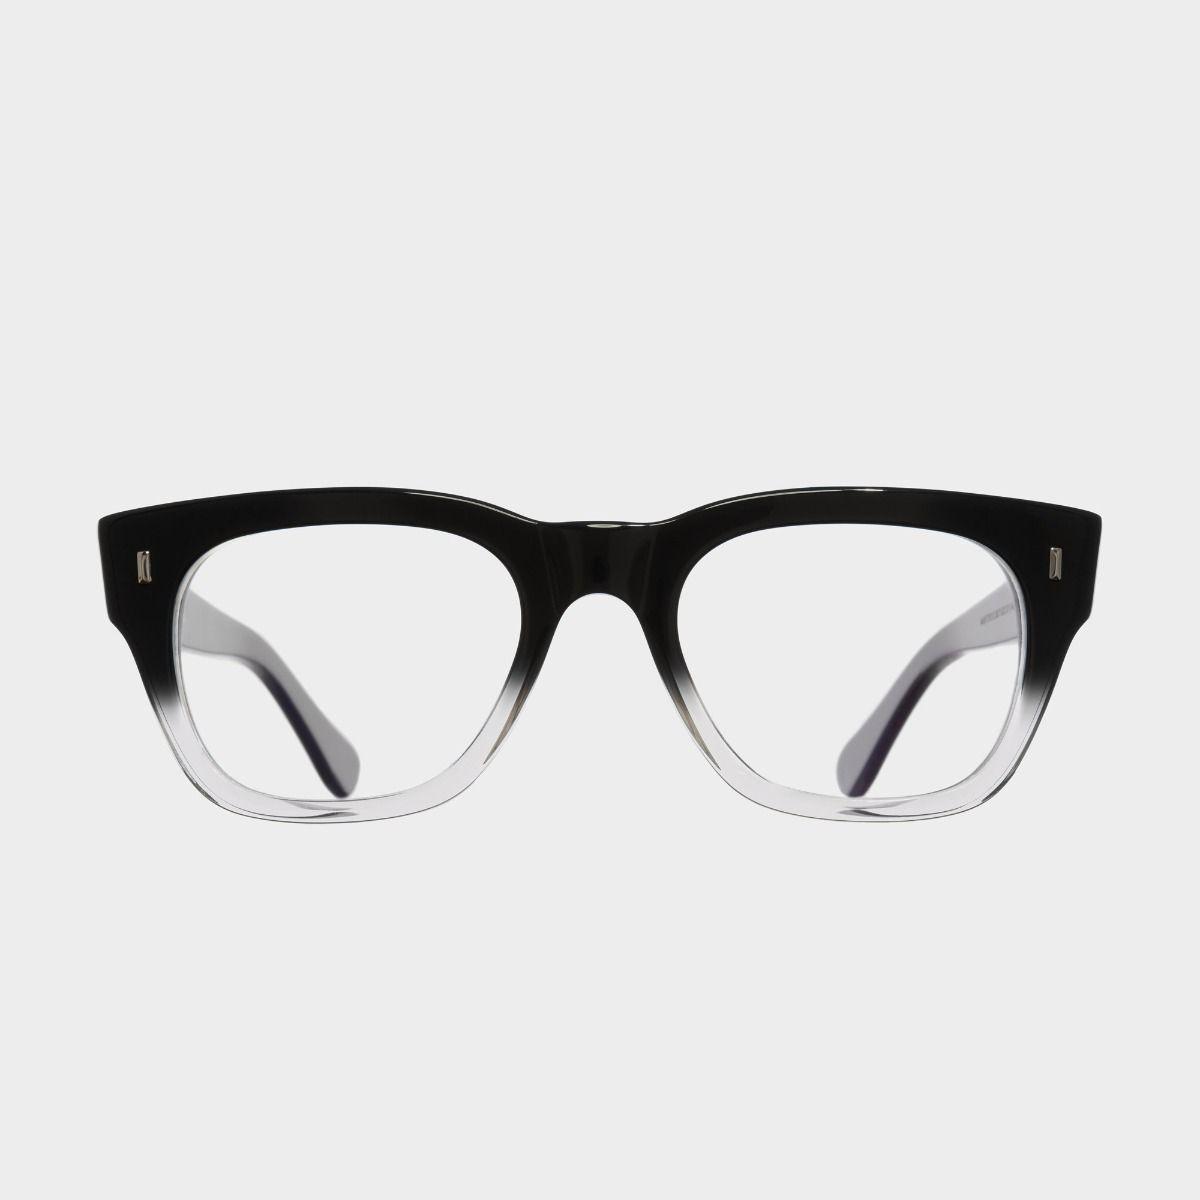 0772V2 Optical Square Glasses